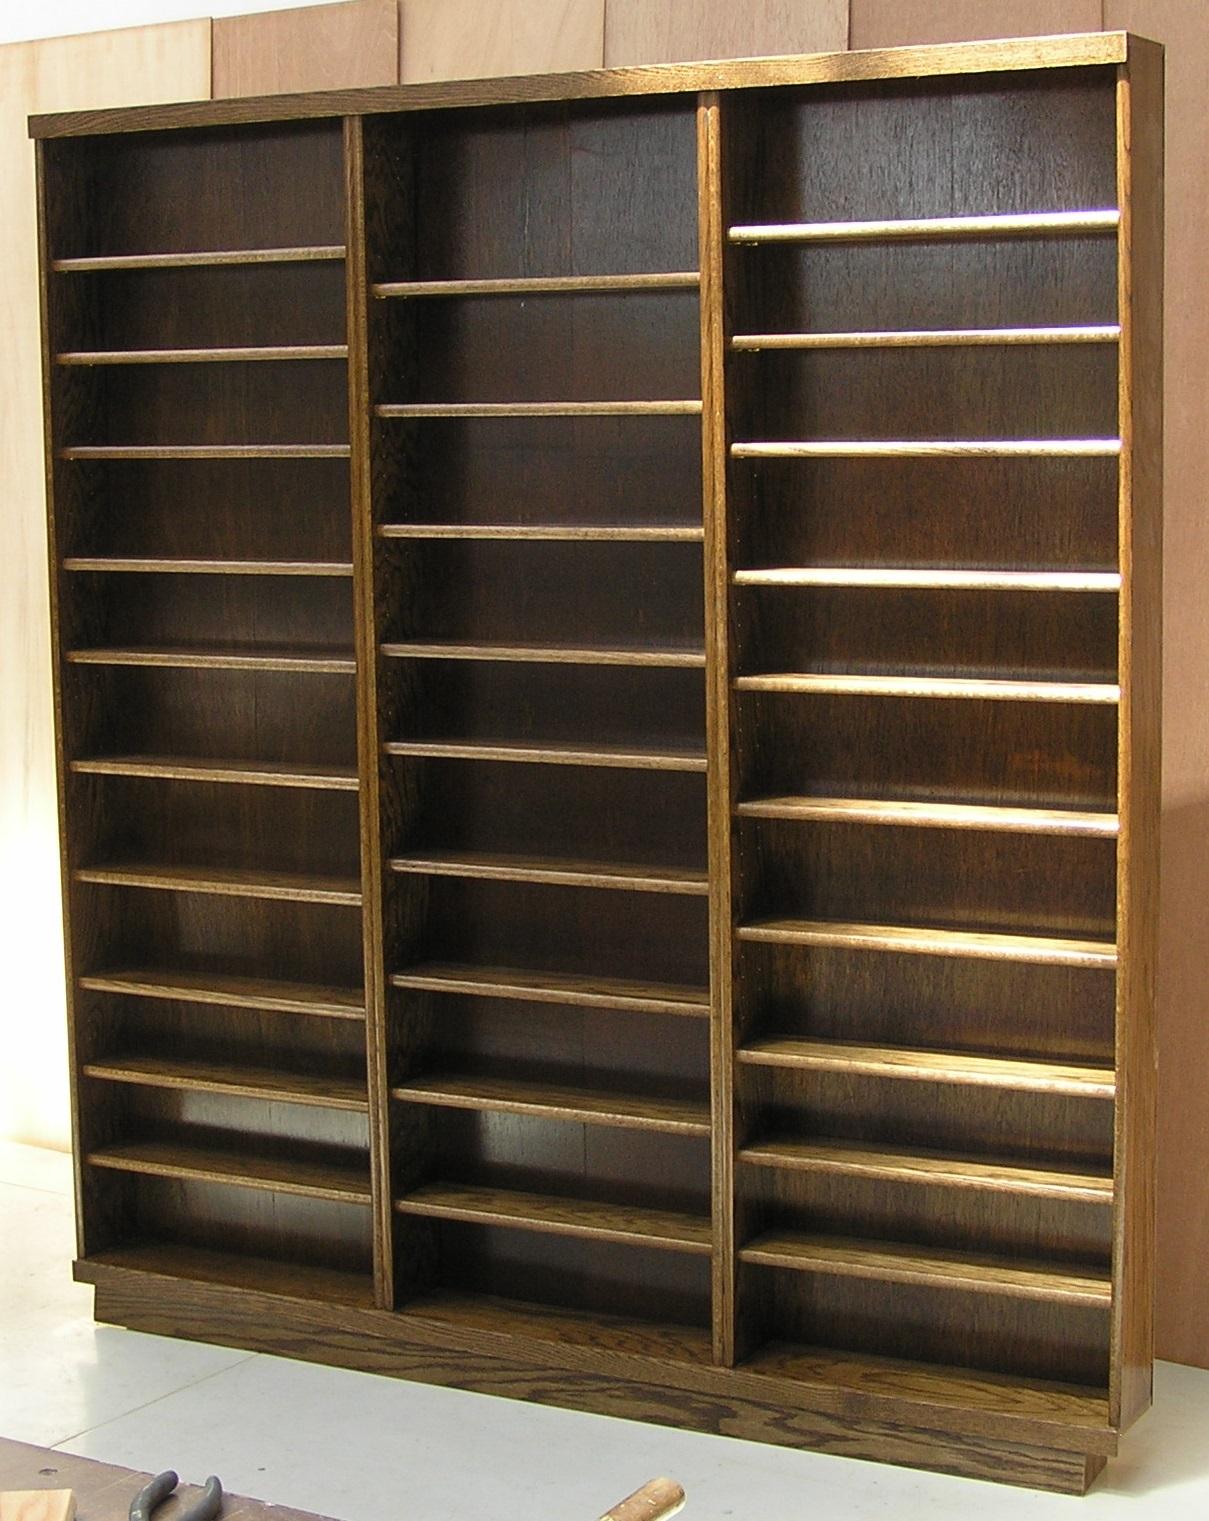 dark-walnut-triple-dvd-cabinet.jpg by decibeldesigns.com adjustable shelves